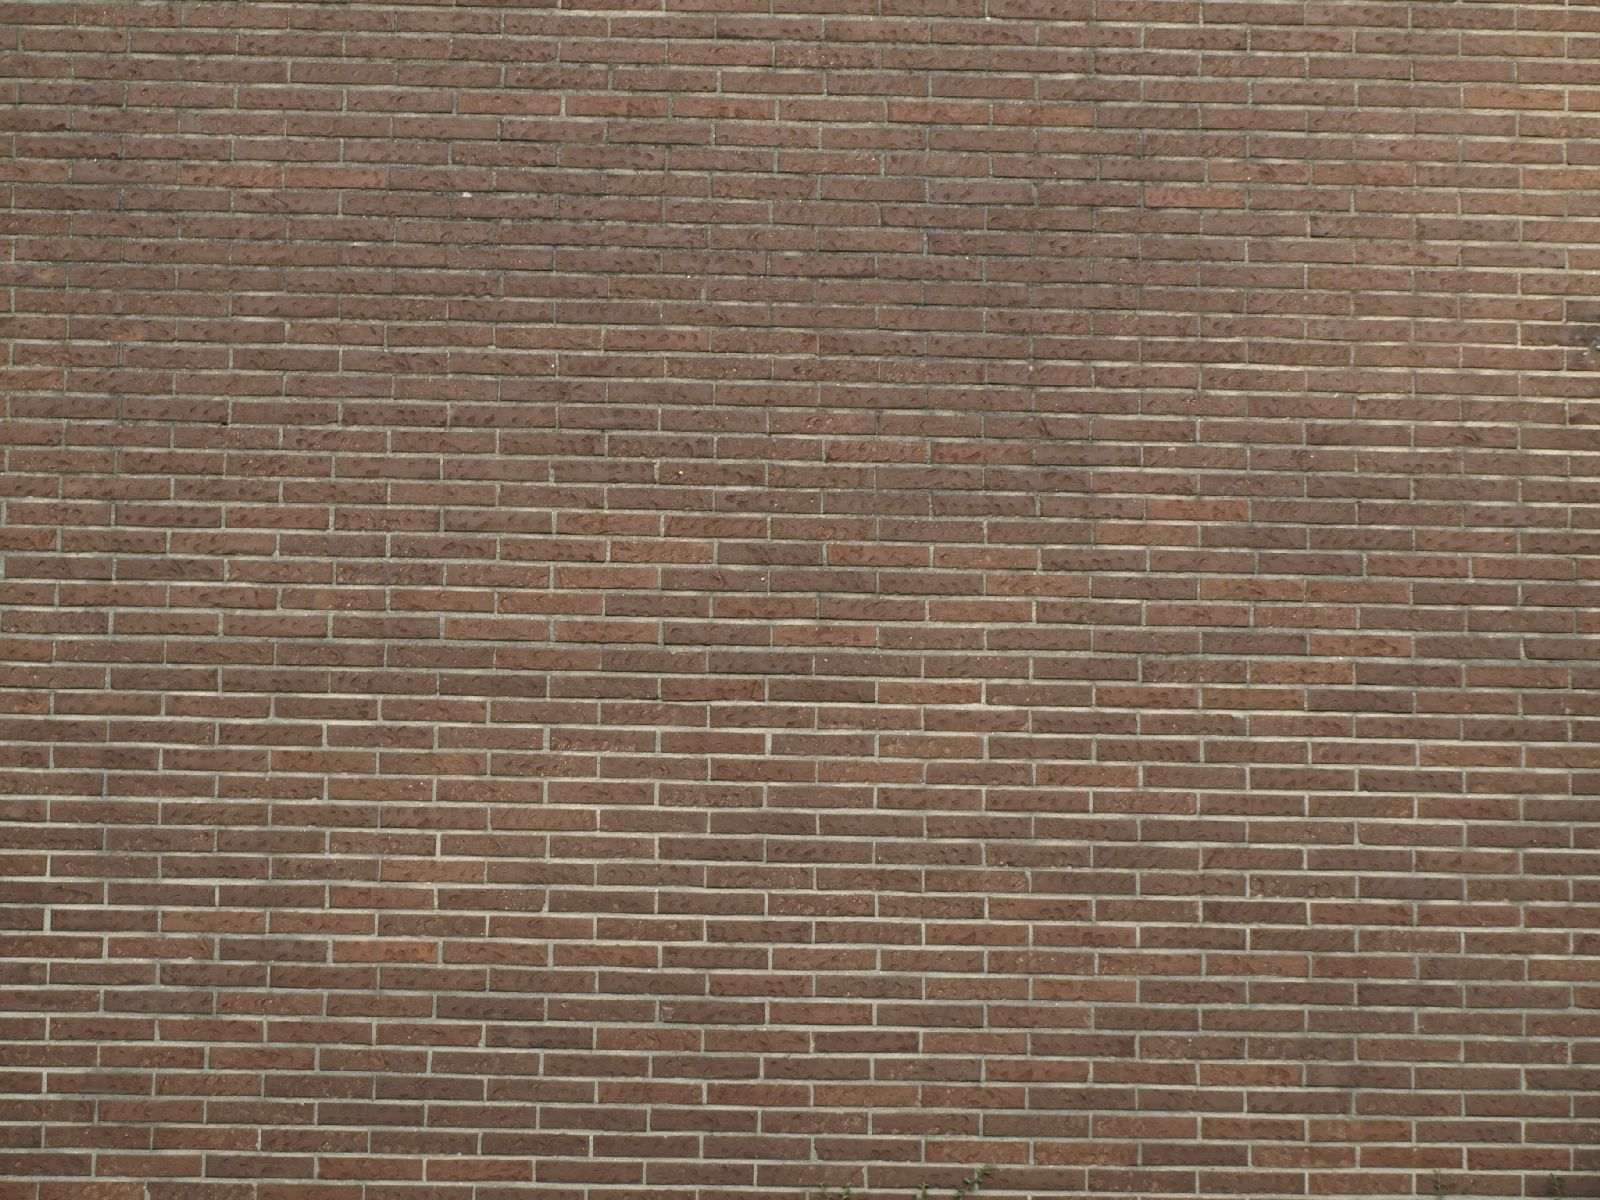 Brick_Texture_A_PA045741